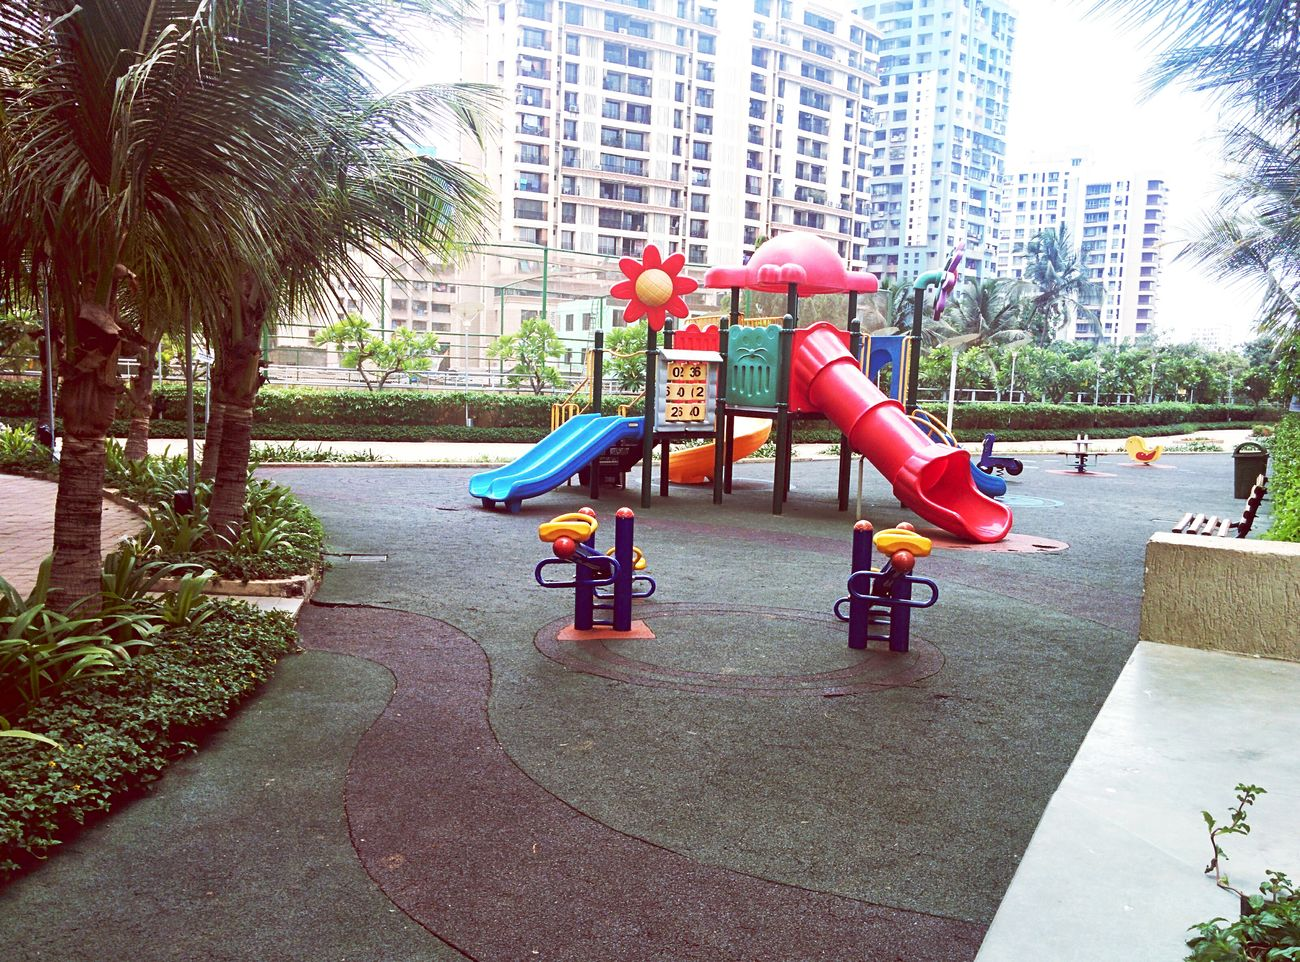 Play Area Kids Zone childhood